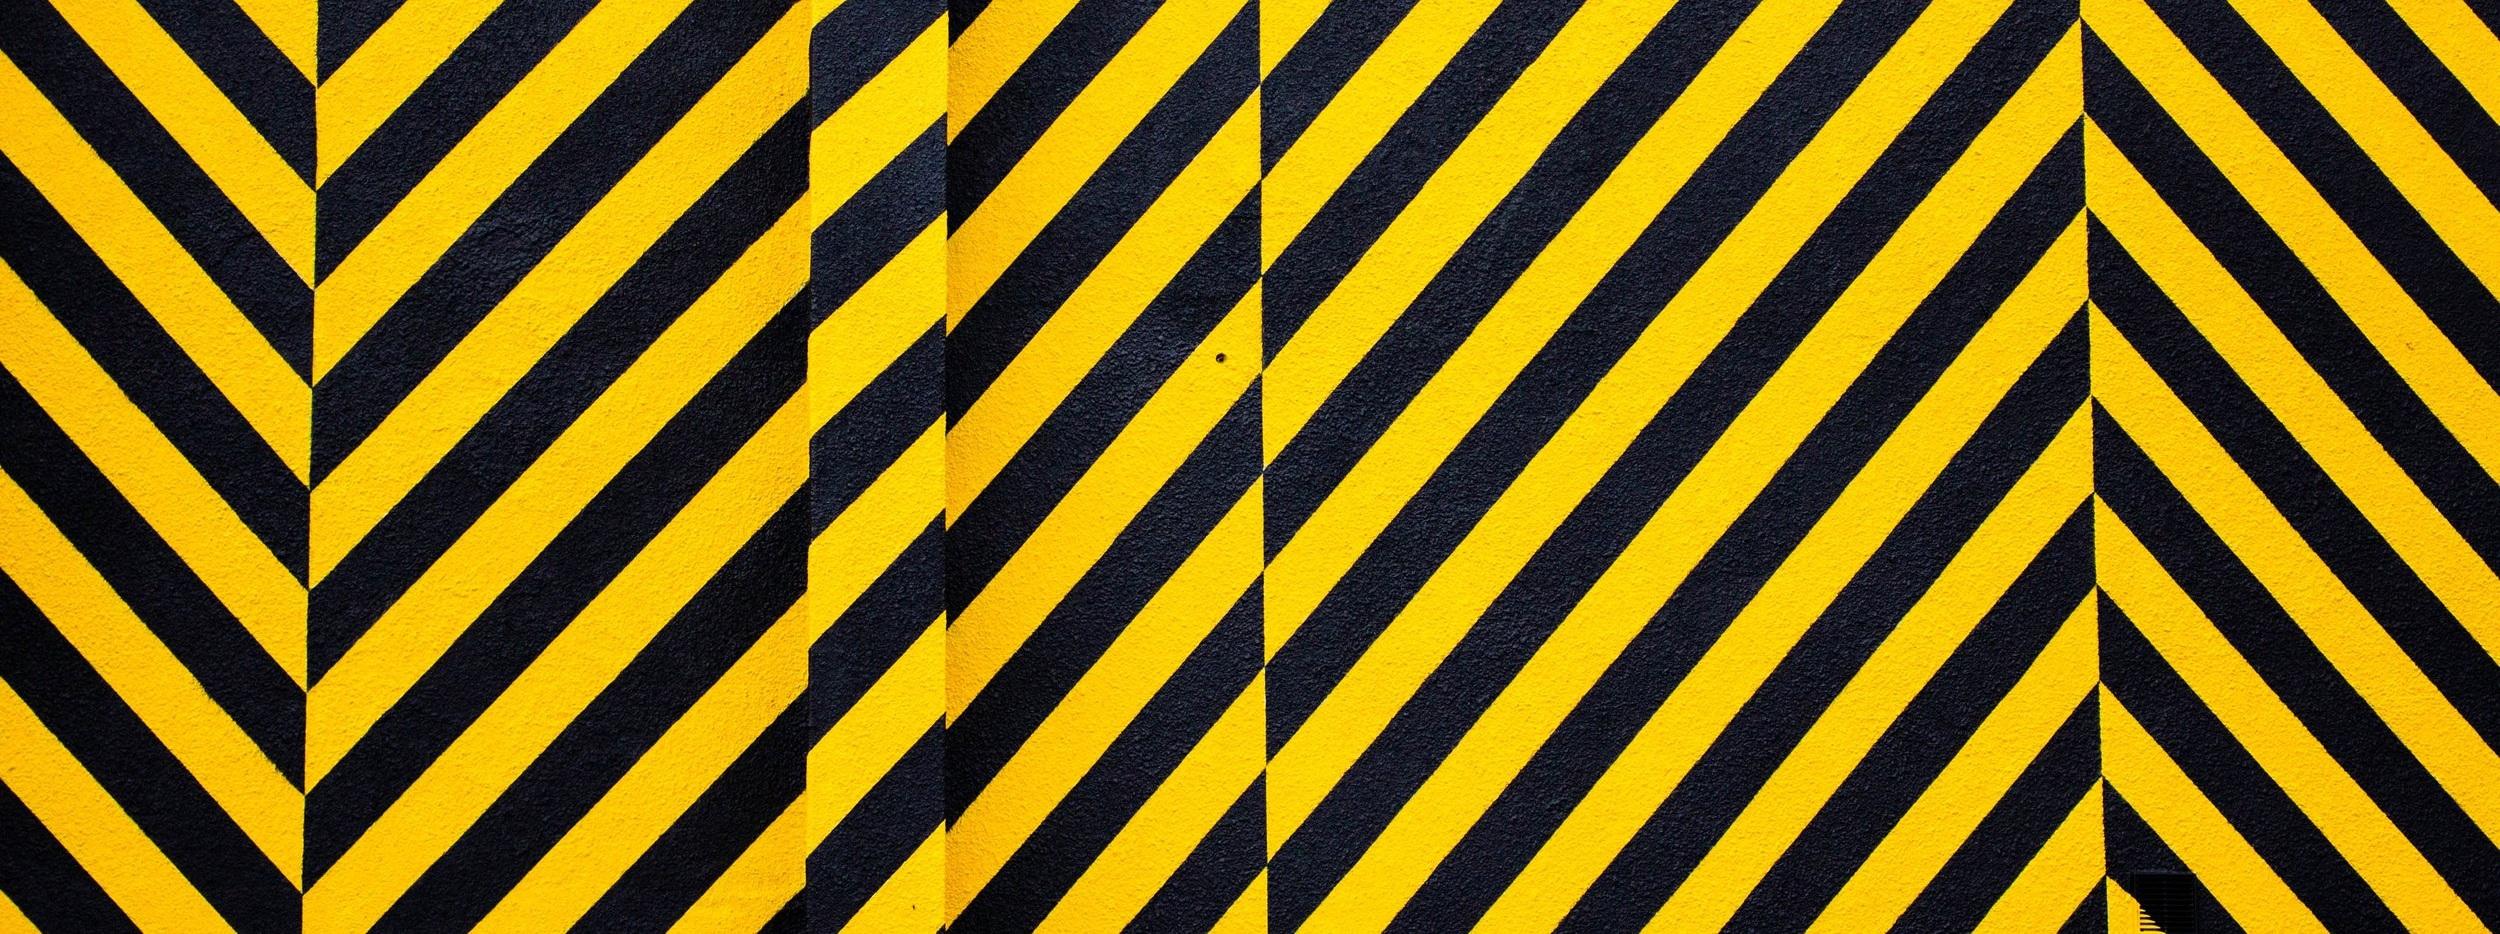 caution-cone-control-211151.jpg